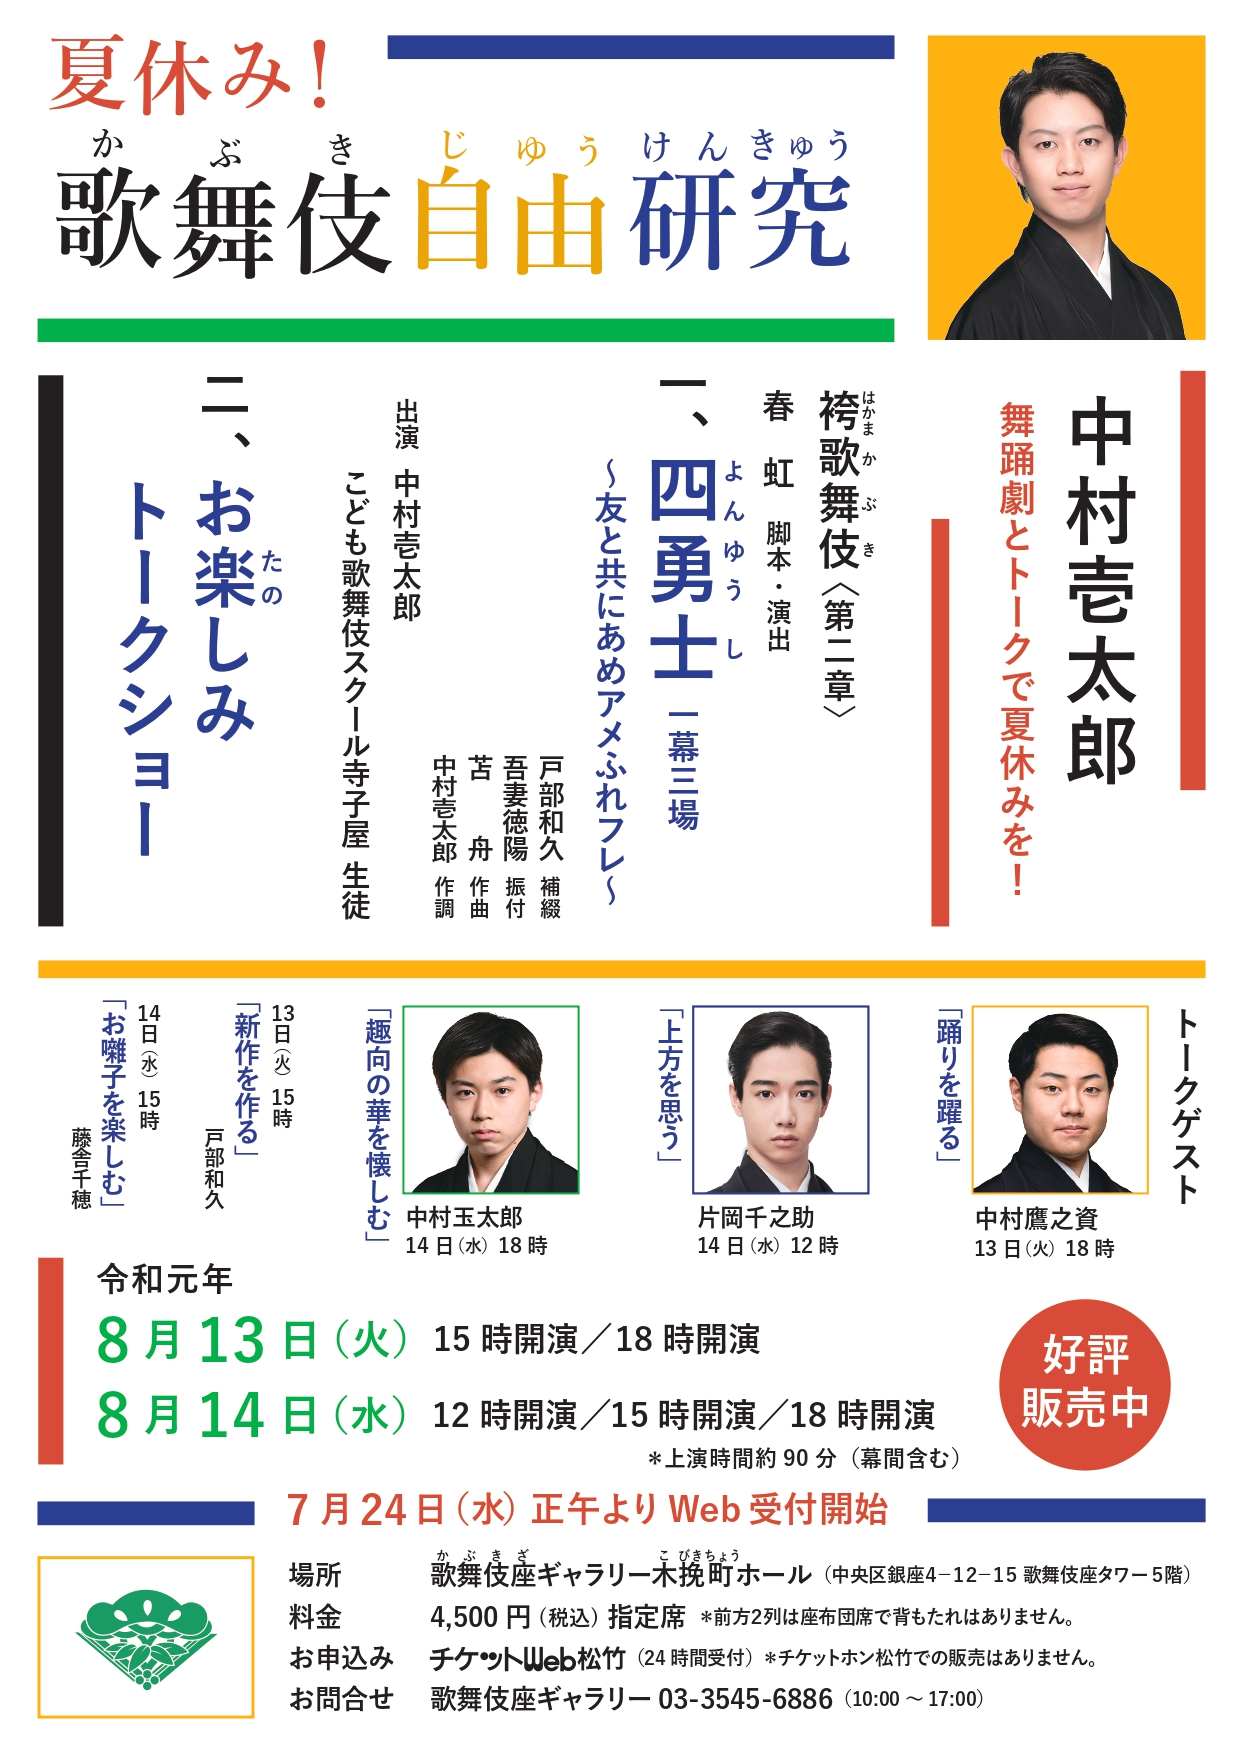 65343_Kazutaro_0807_page-0001.jpg